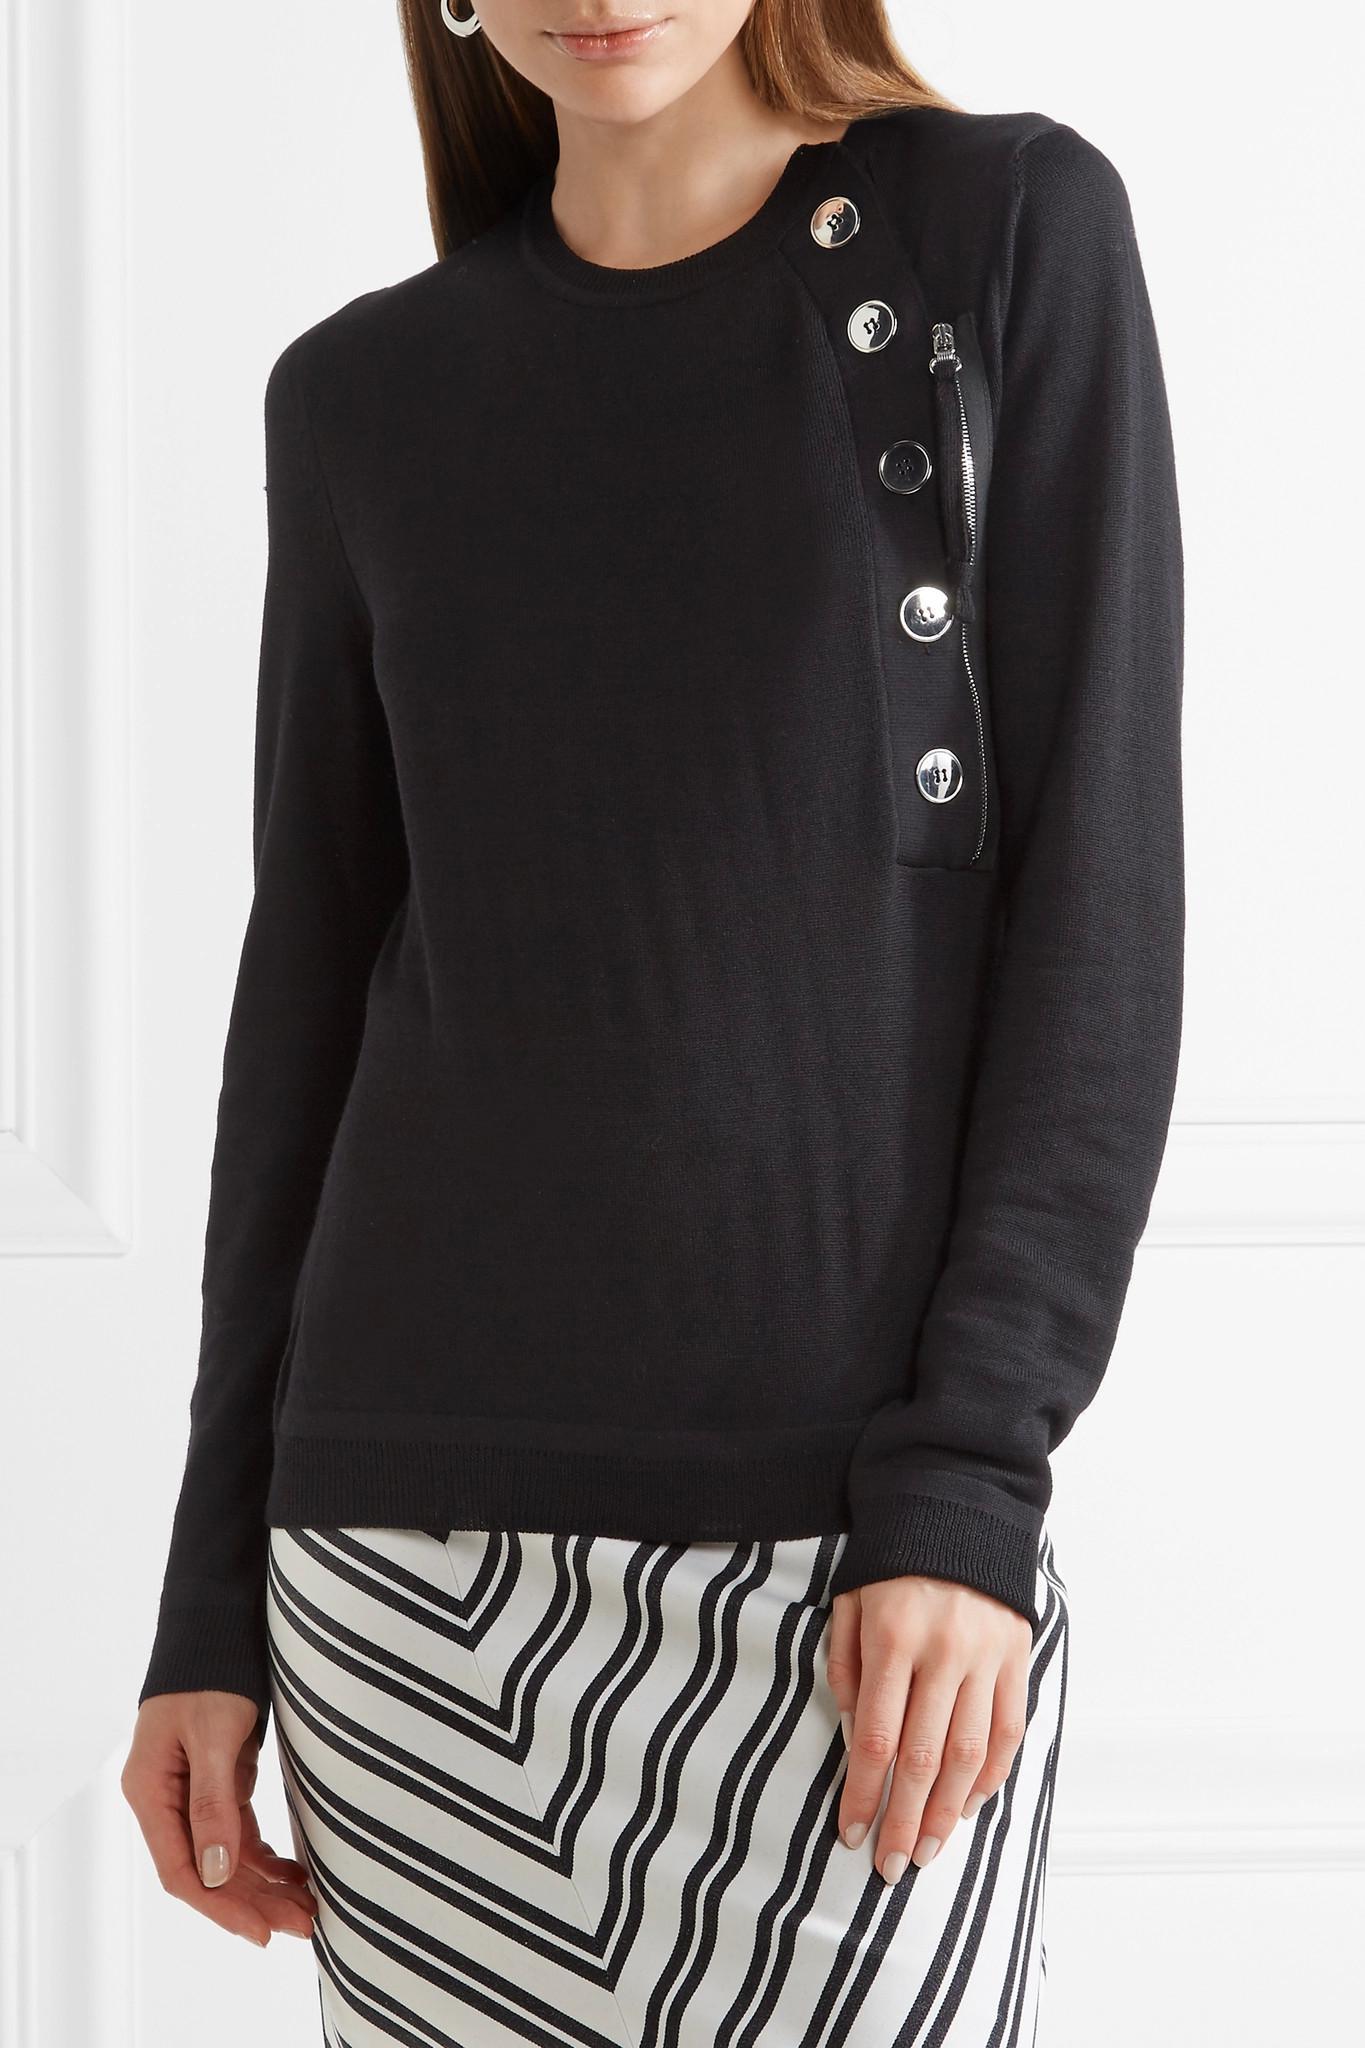 Collier Button-embellished Merino Wool Sweater - Black Altuzarra Cheap Sale Visa Payment hM5gt